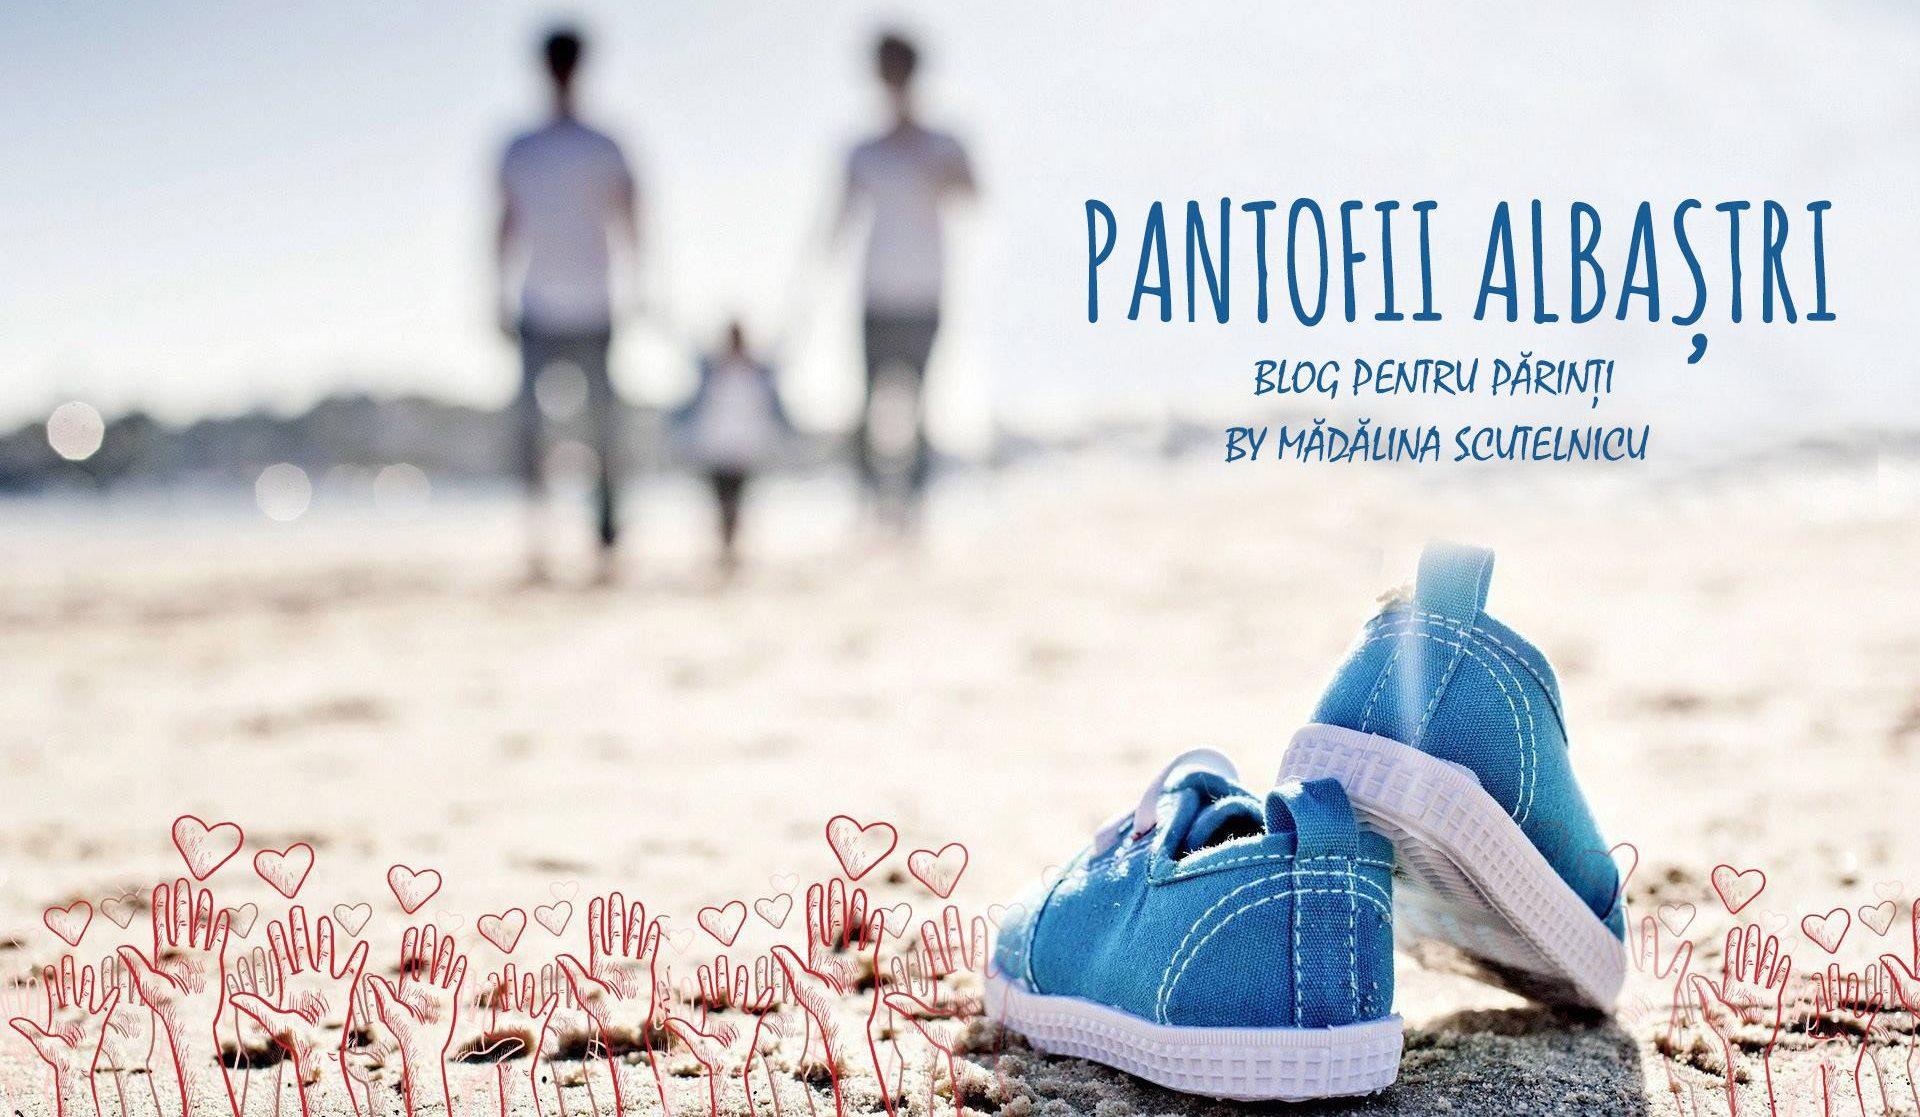 Pantofii Albaștri